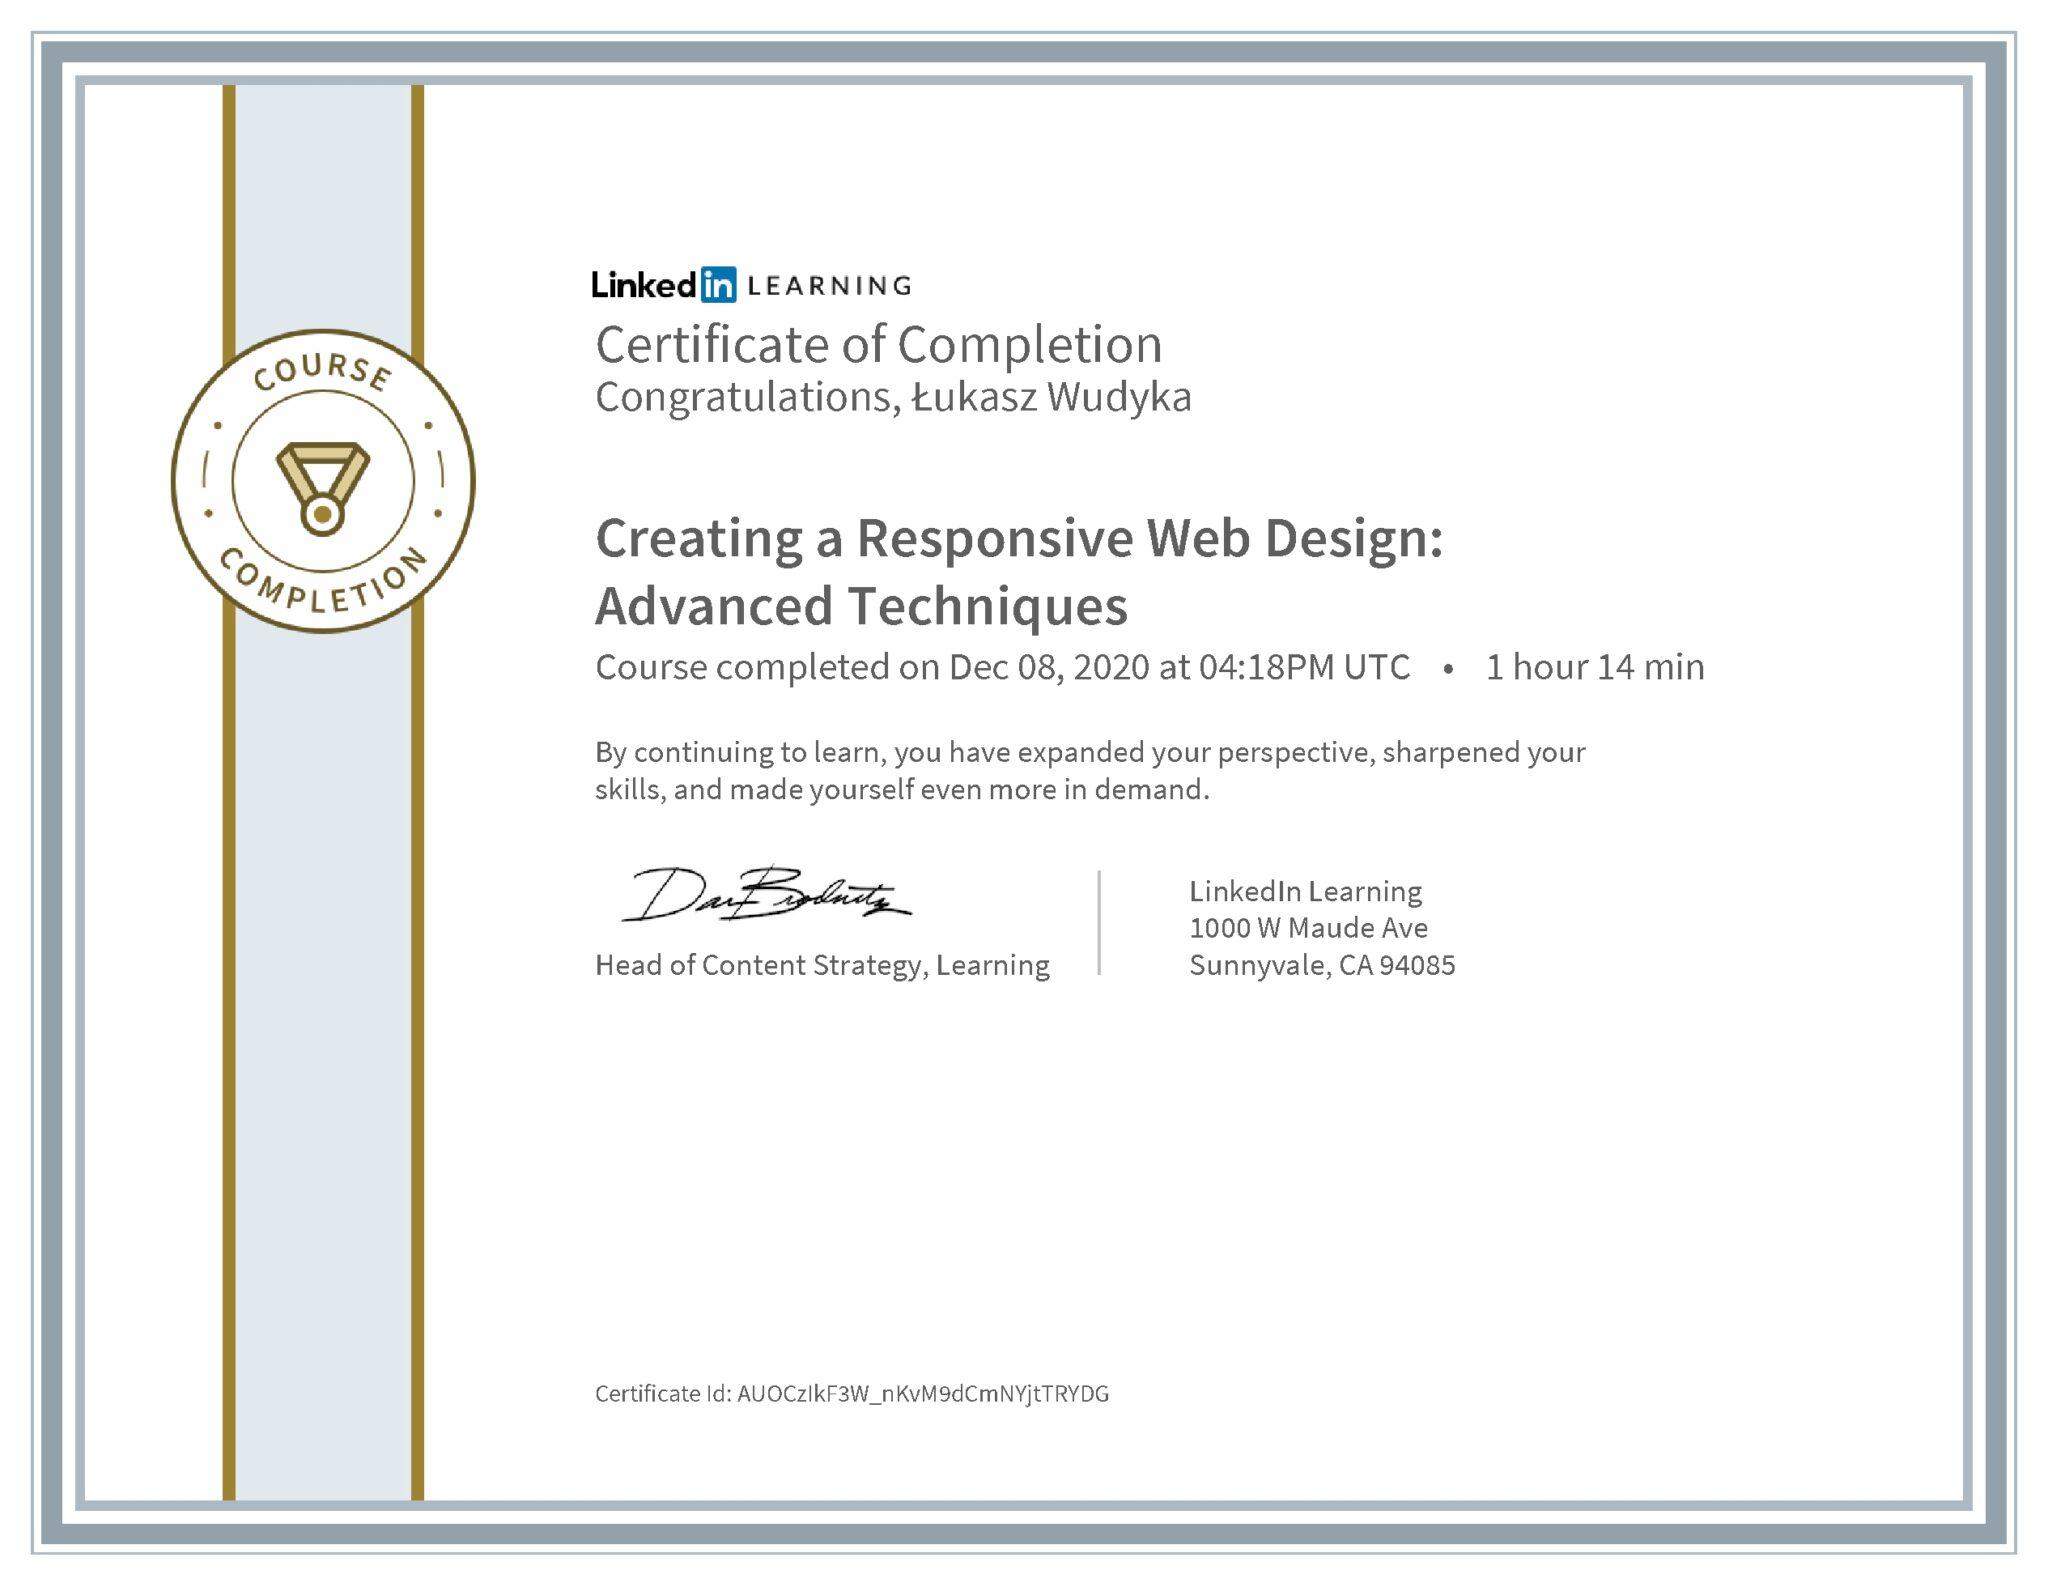 Łukasz Wudyka certyfikat LinkedIn Creating a Responsive Web Design: Advanced Techniques